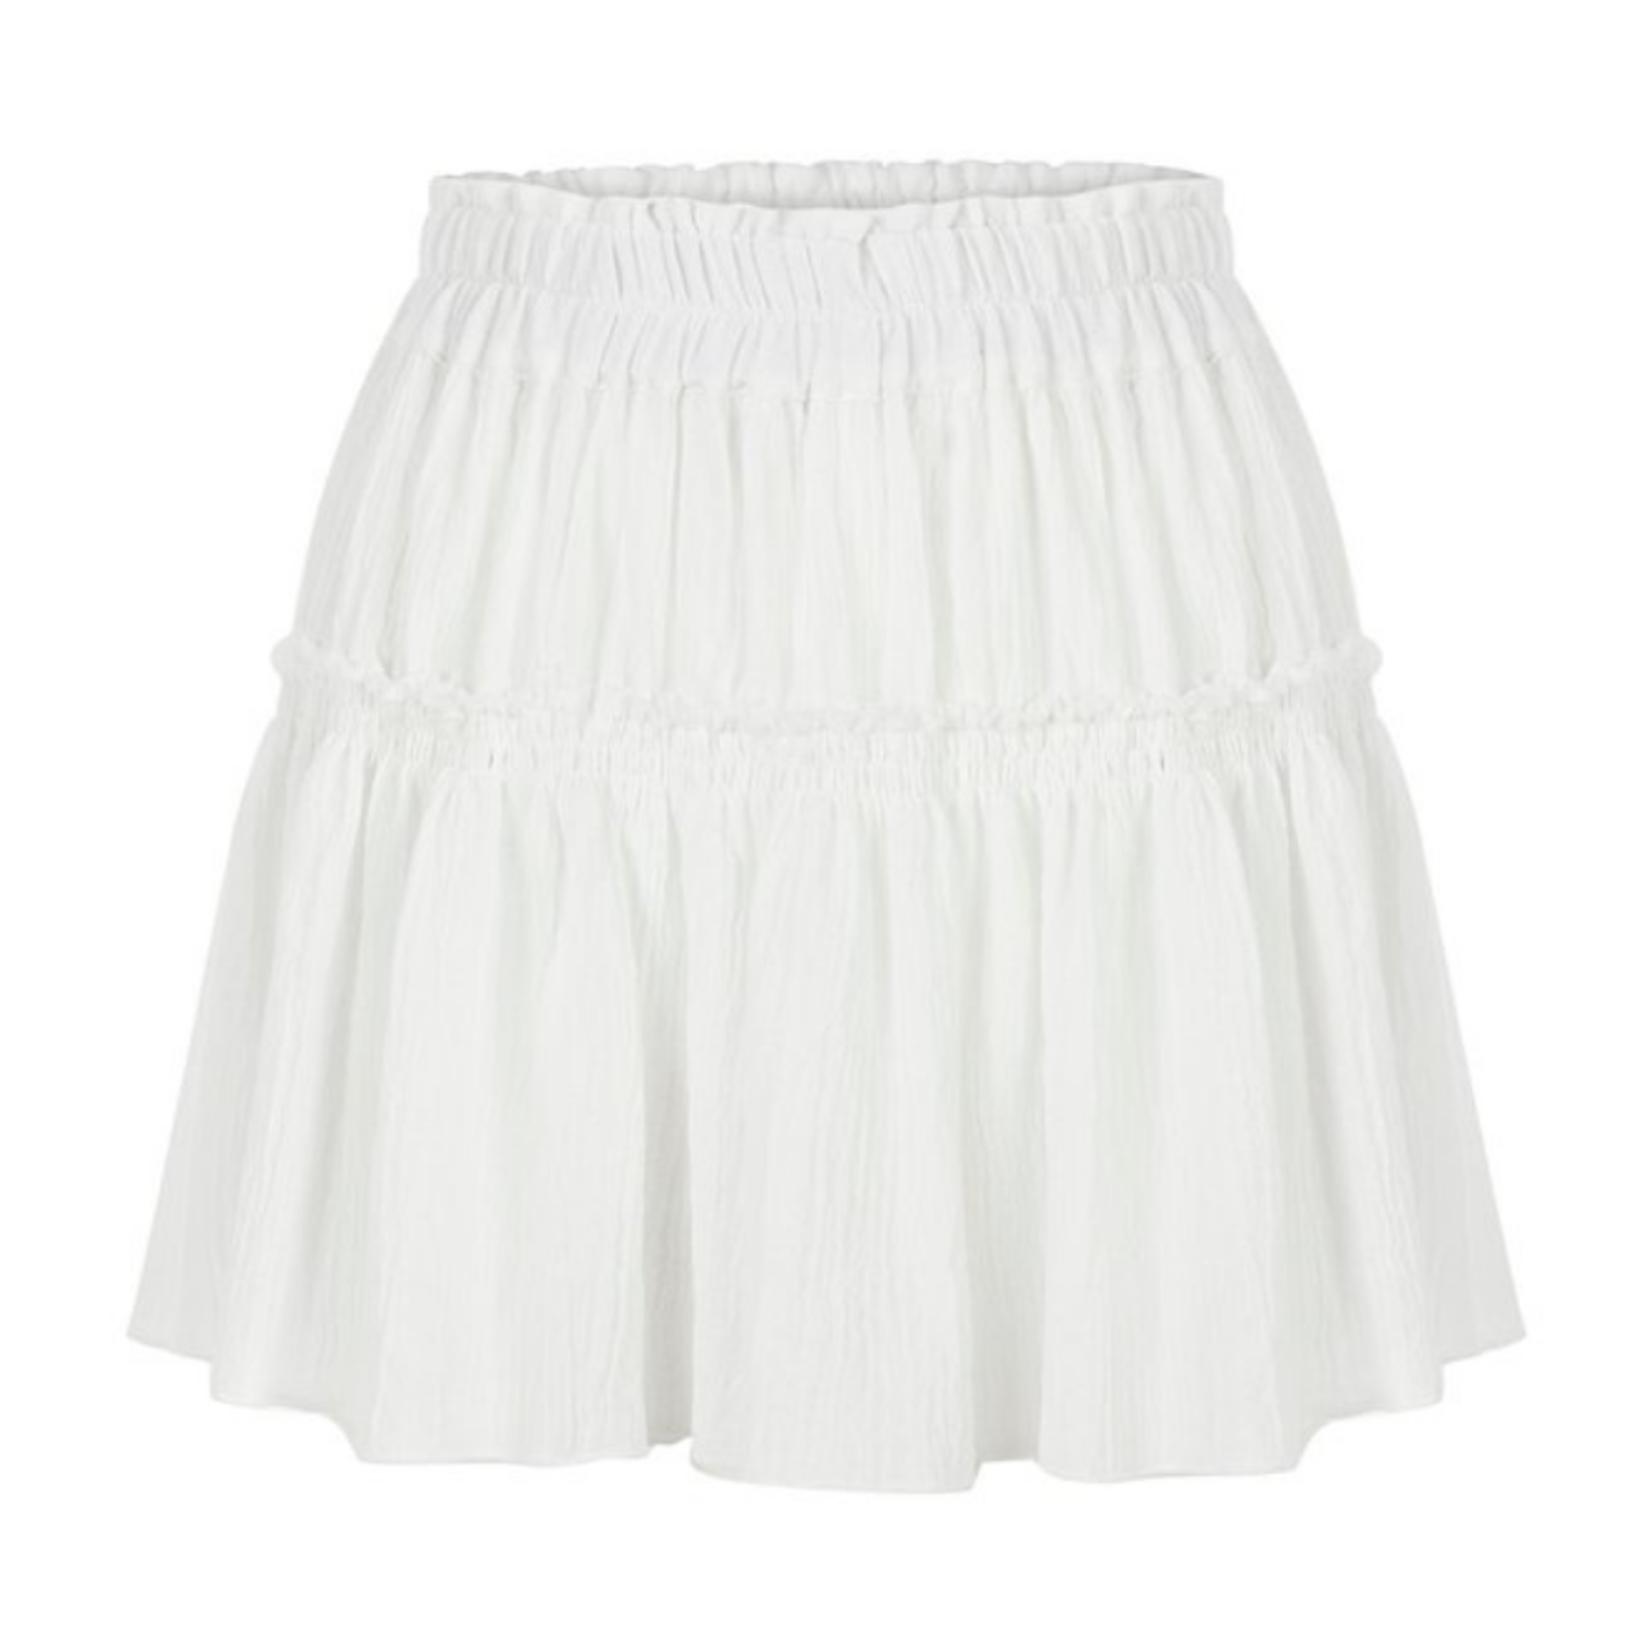 Handloom Ash Mini Skirt